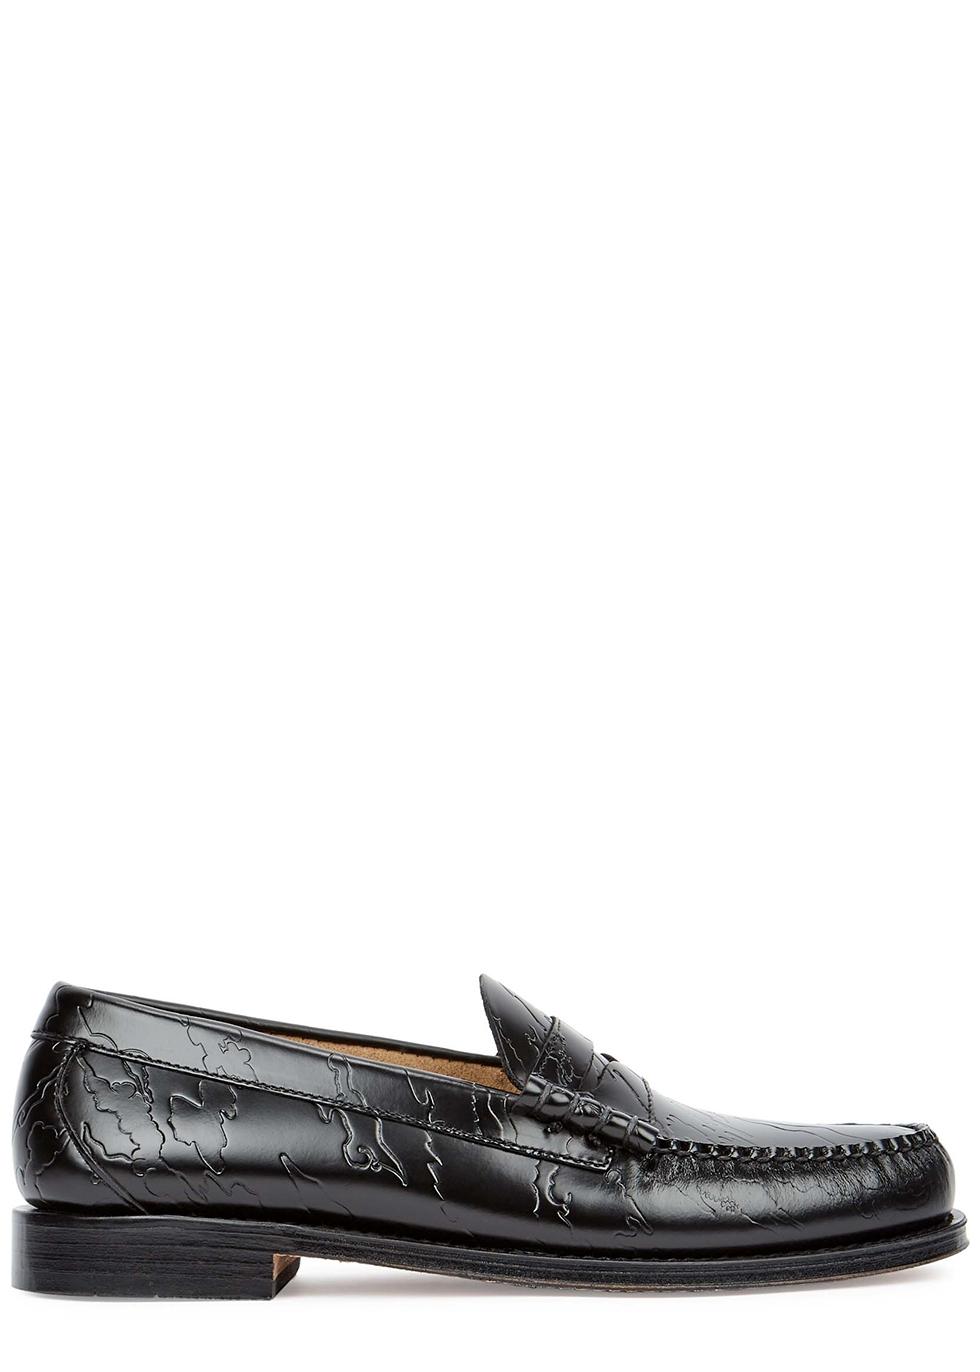 X Maharishi Weejuns Larson black leather loafers